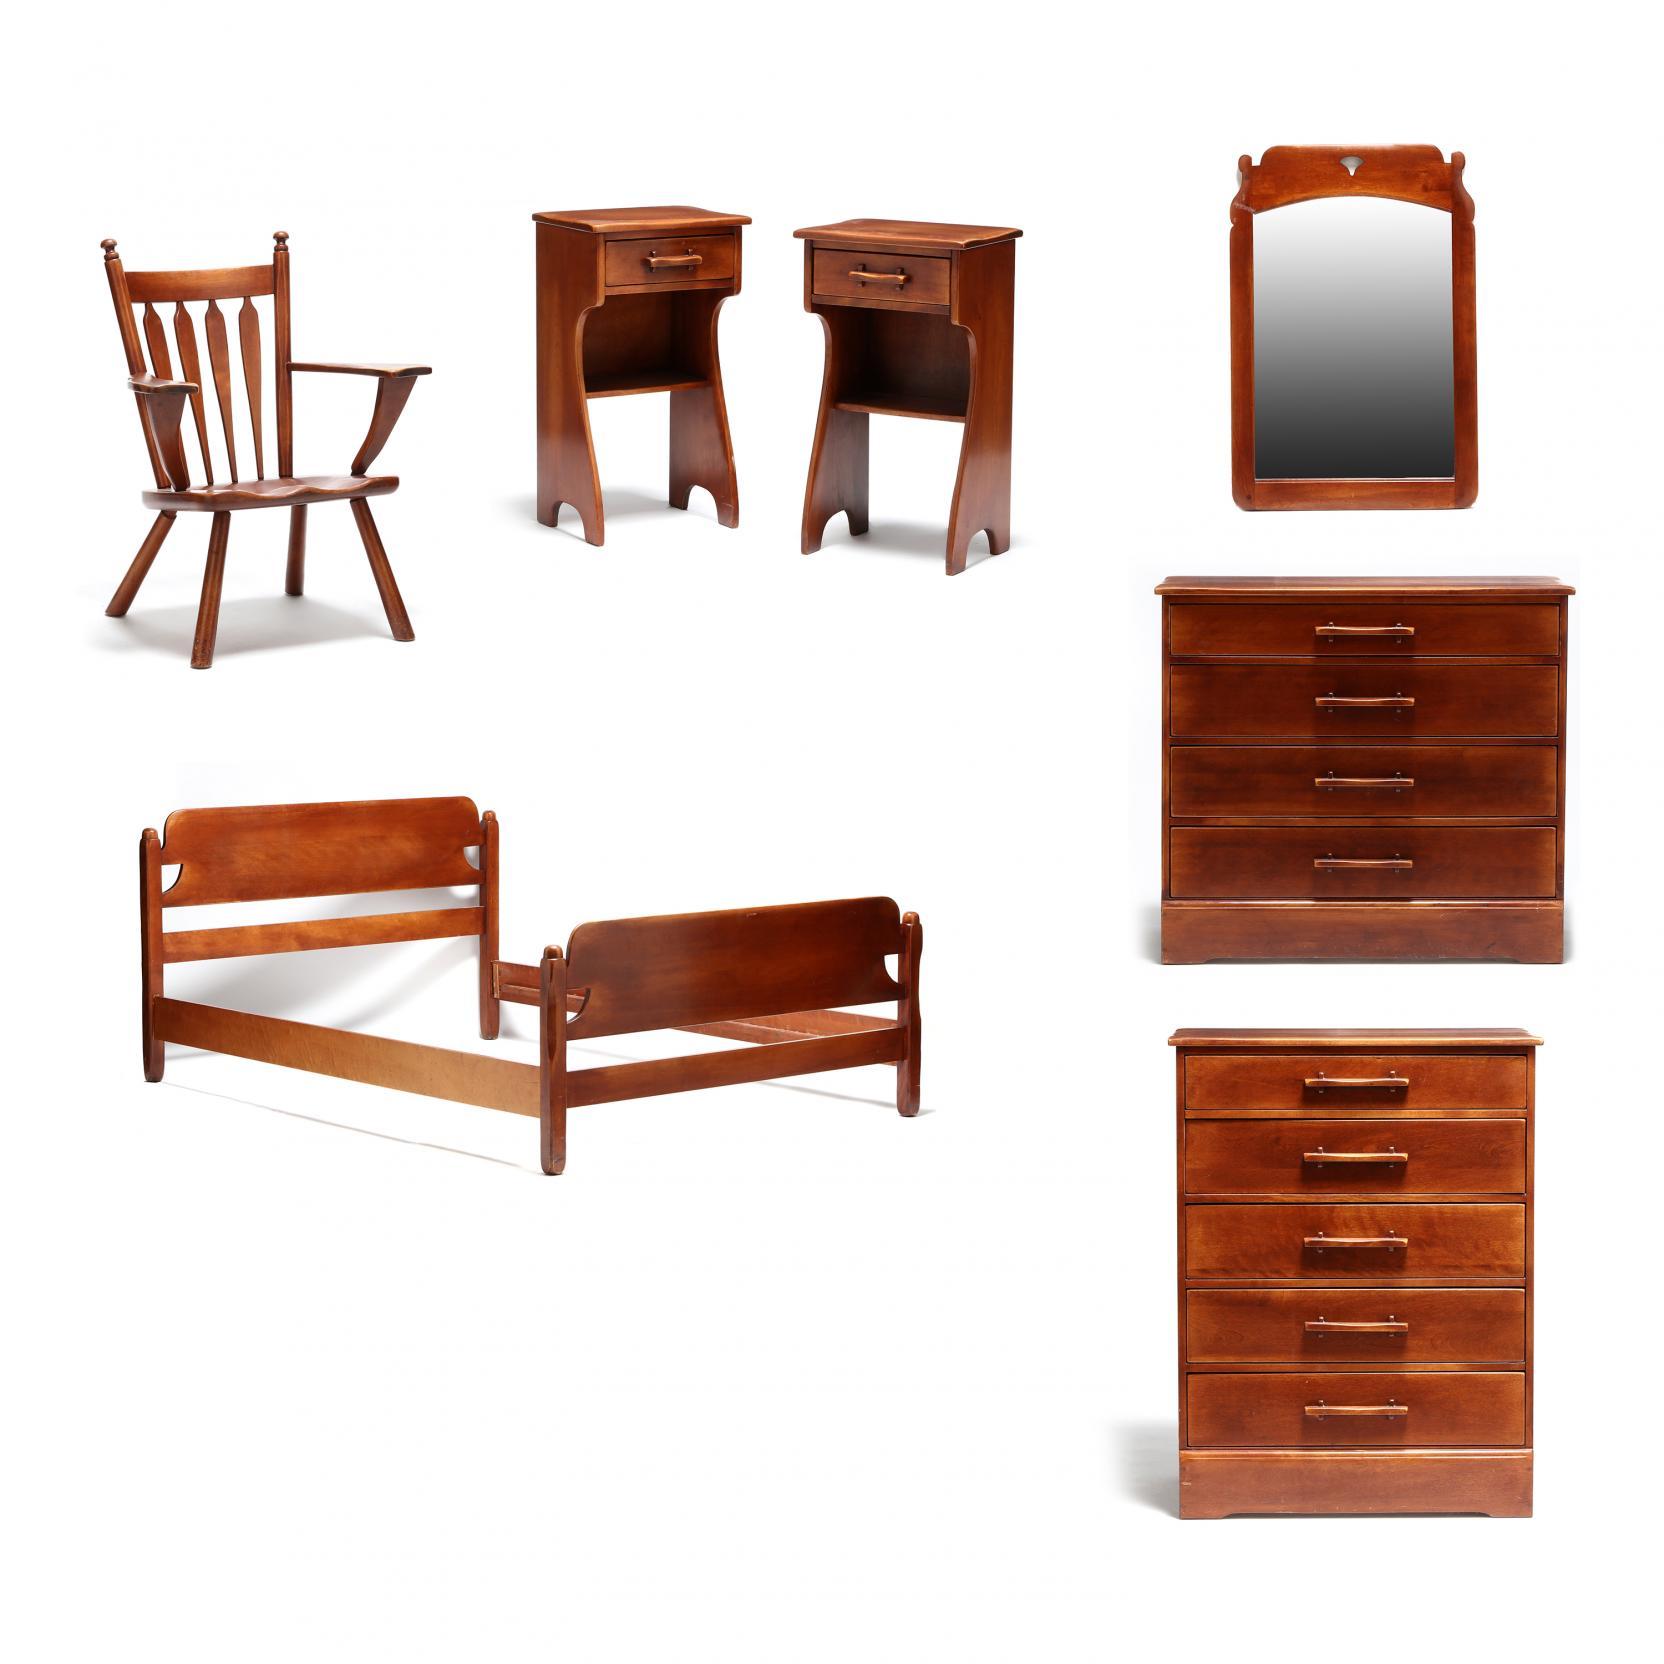 cushman-colonial-creation-bedroom-suite